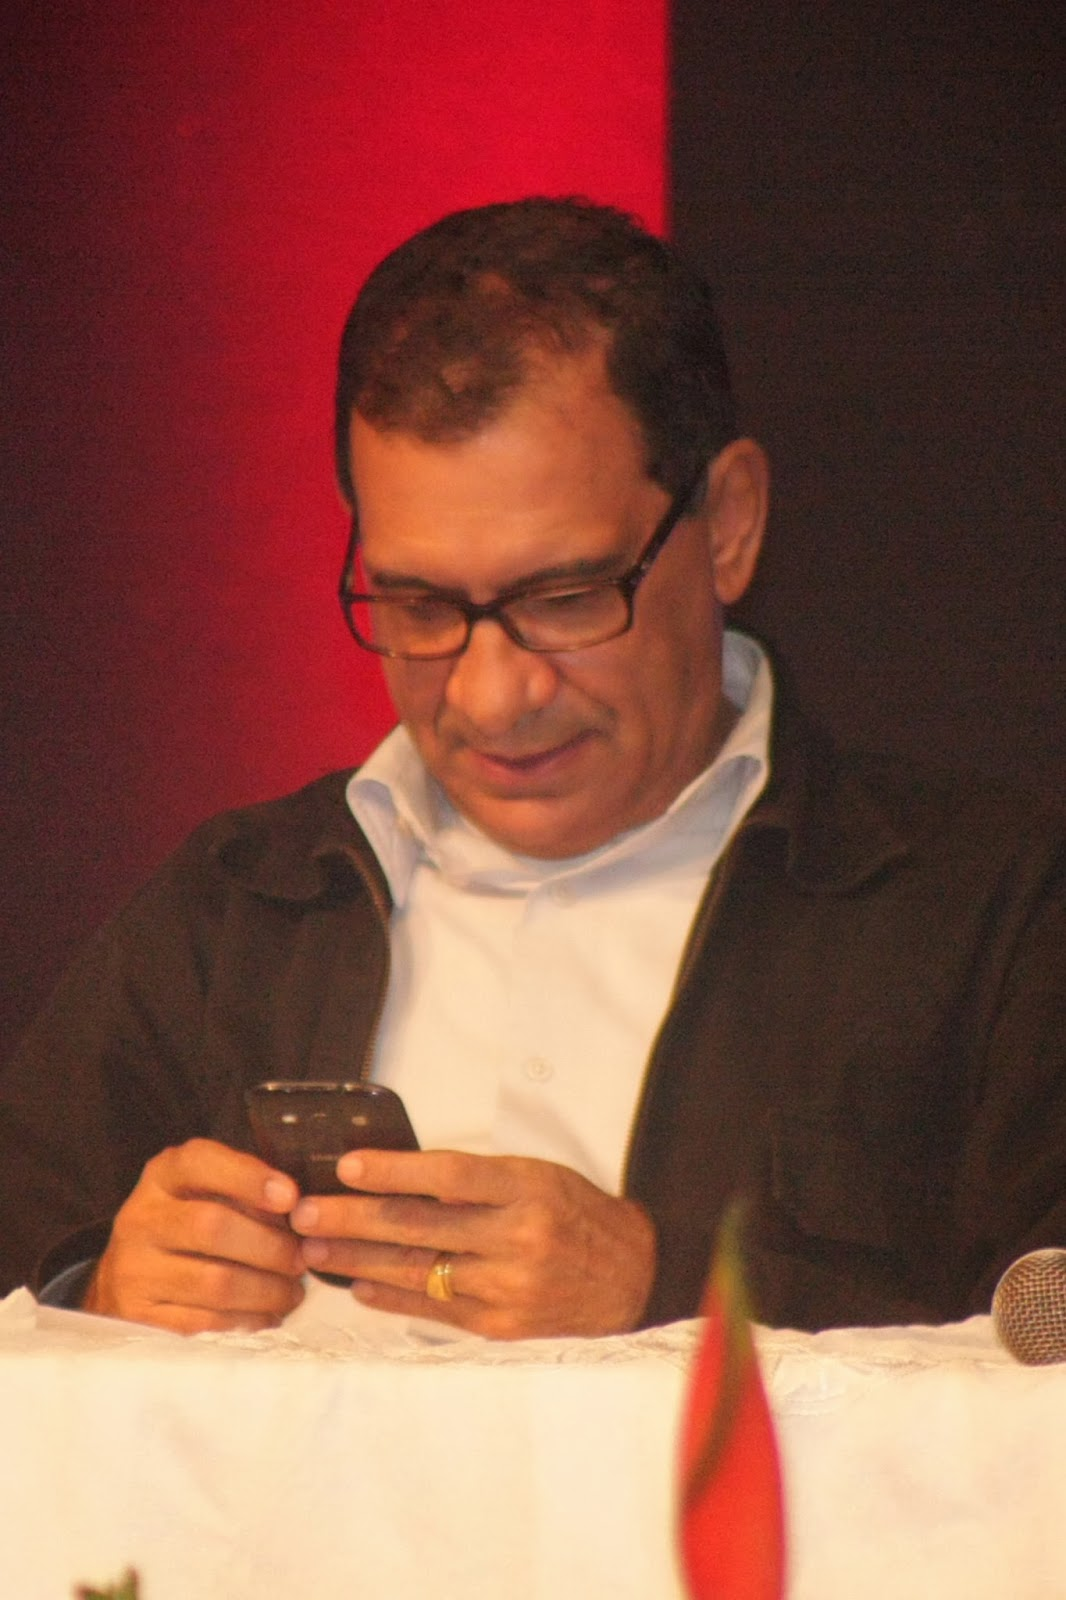 Prefeito Jabes Ribeiro. Foto: José Nazal/Blog Catucadas.